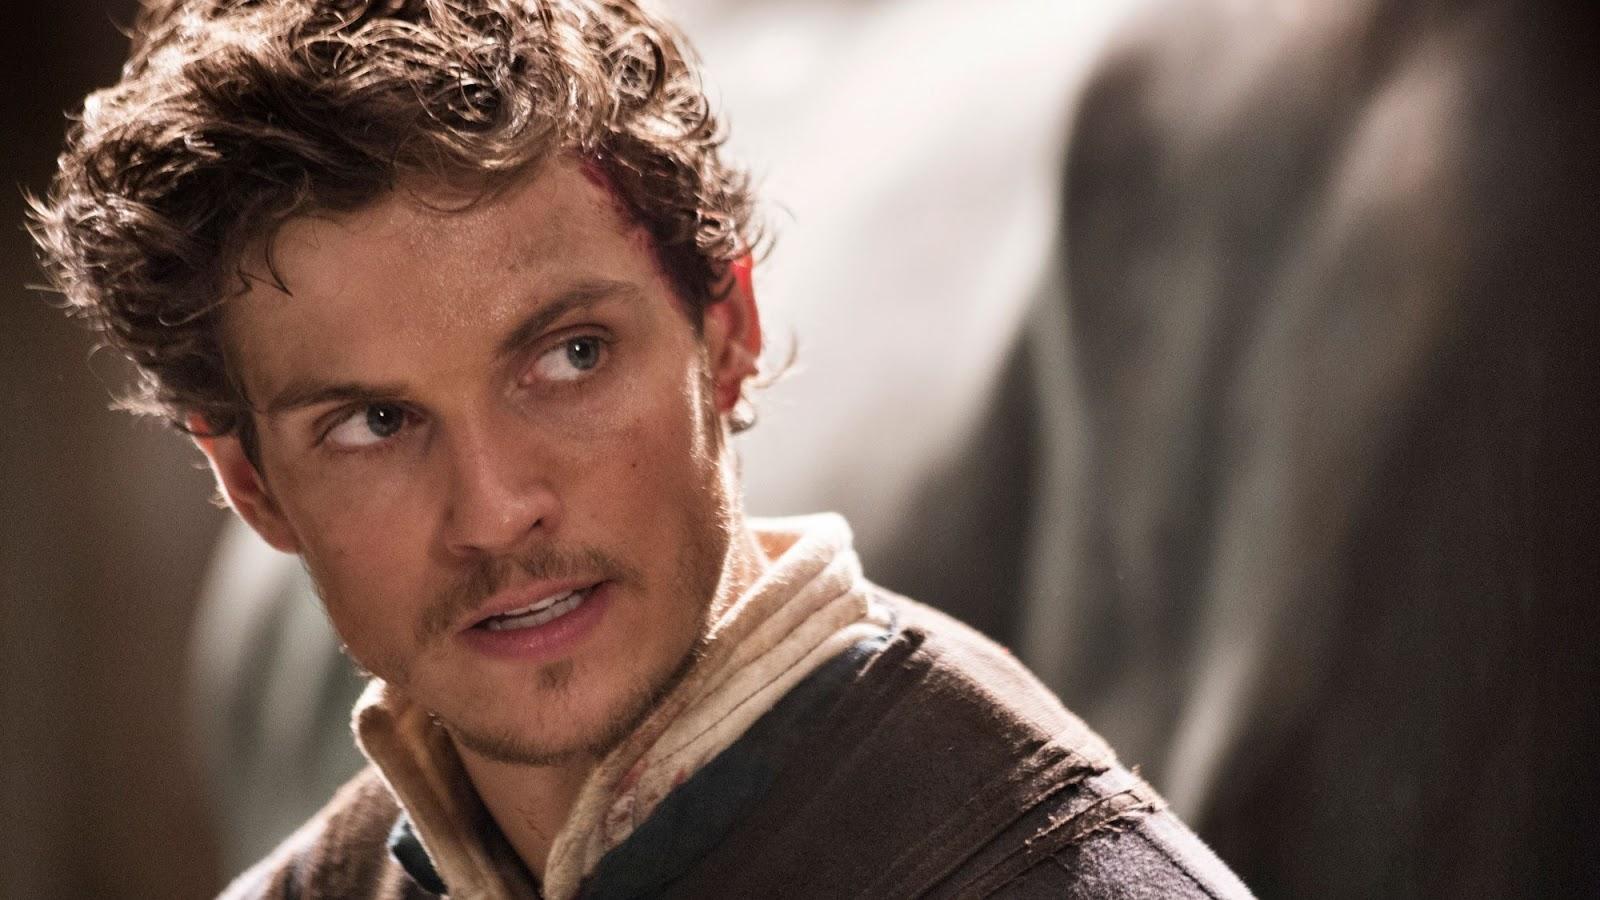 'Medici' Season 3 Teaser Trailer Reveals Thrilling Final Chapter